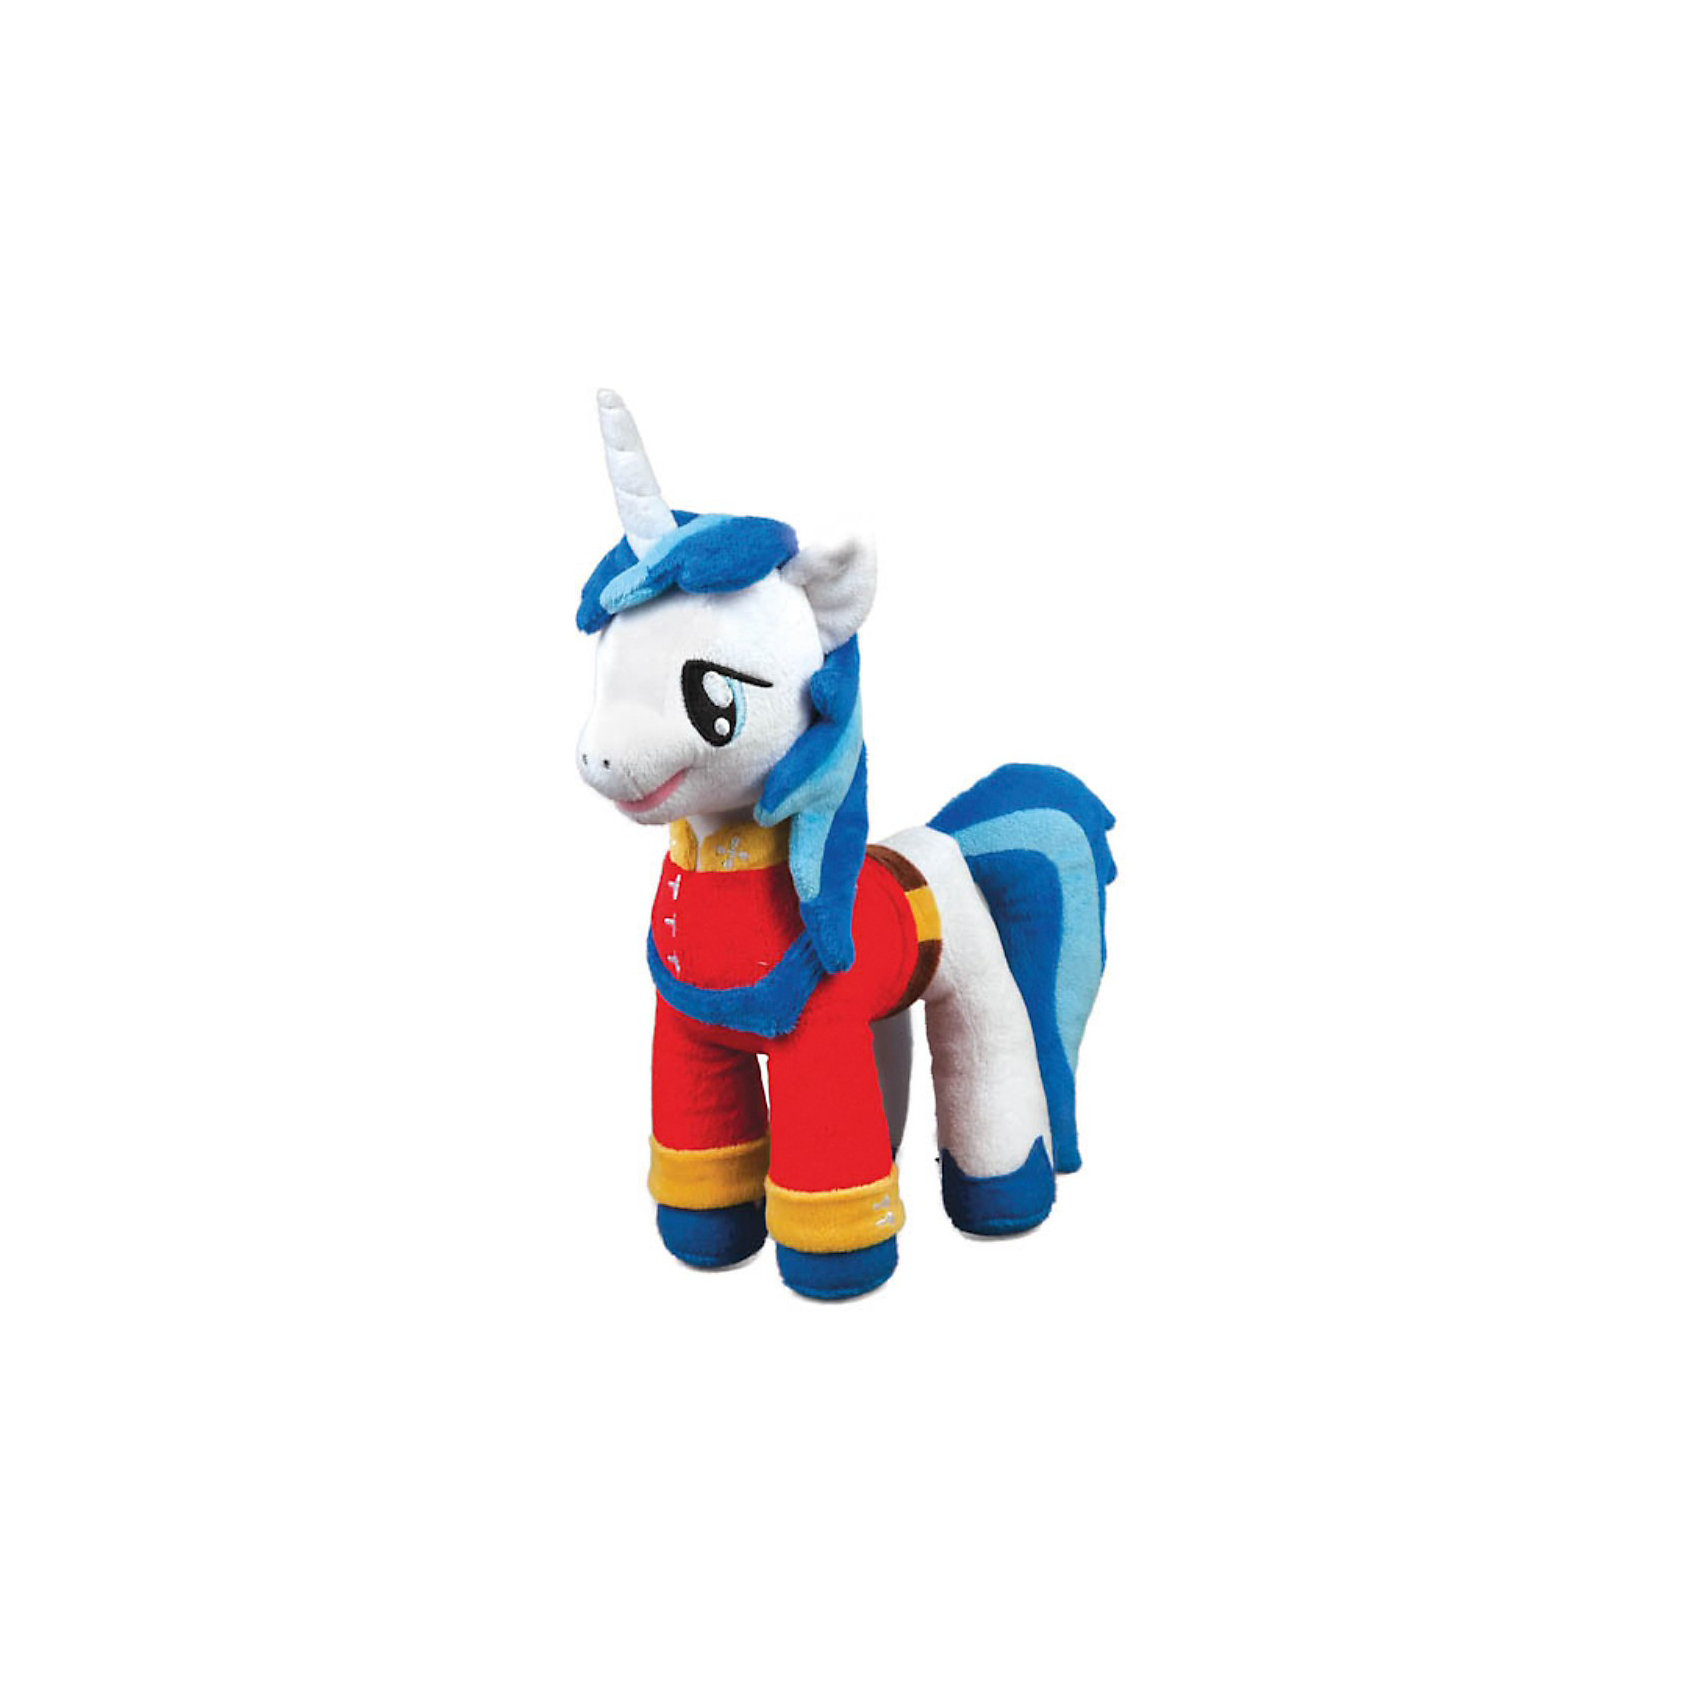 МУЛЬТИ-ПУЛЬТИ Пони Принц Армор, со звуком, My little Pony, МУЛЬТИ-ПУЛЬТИ мульти пульти мягкая игрушка крокодильчик свомпи where is my water со звуком 20 см мульти пульти